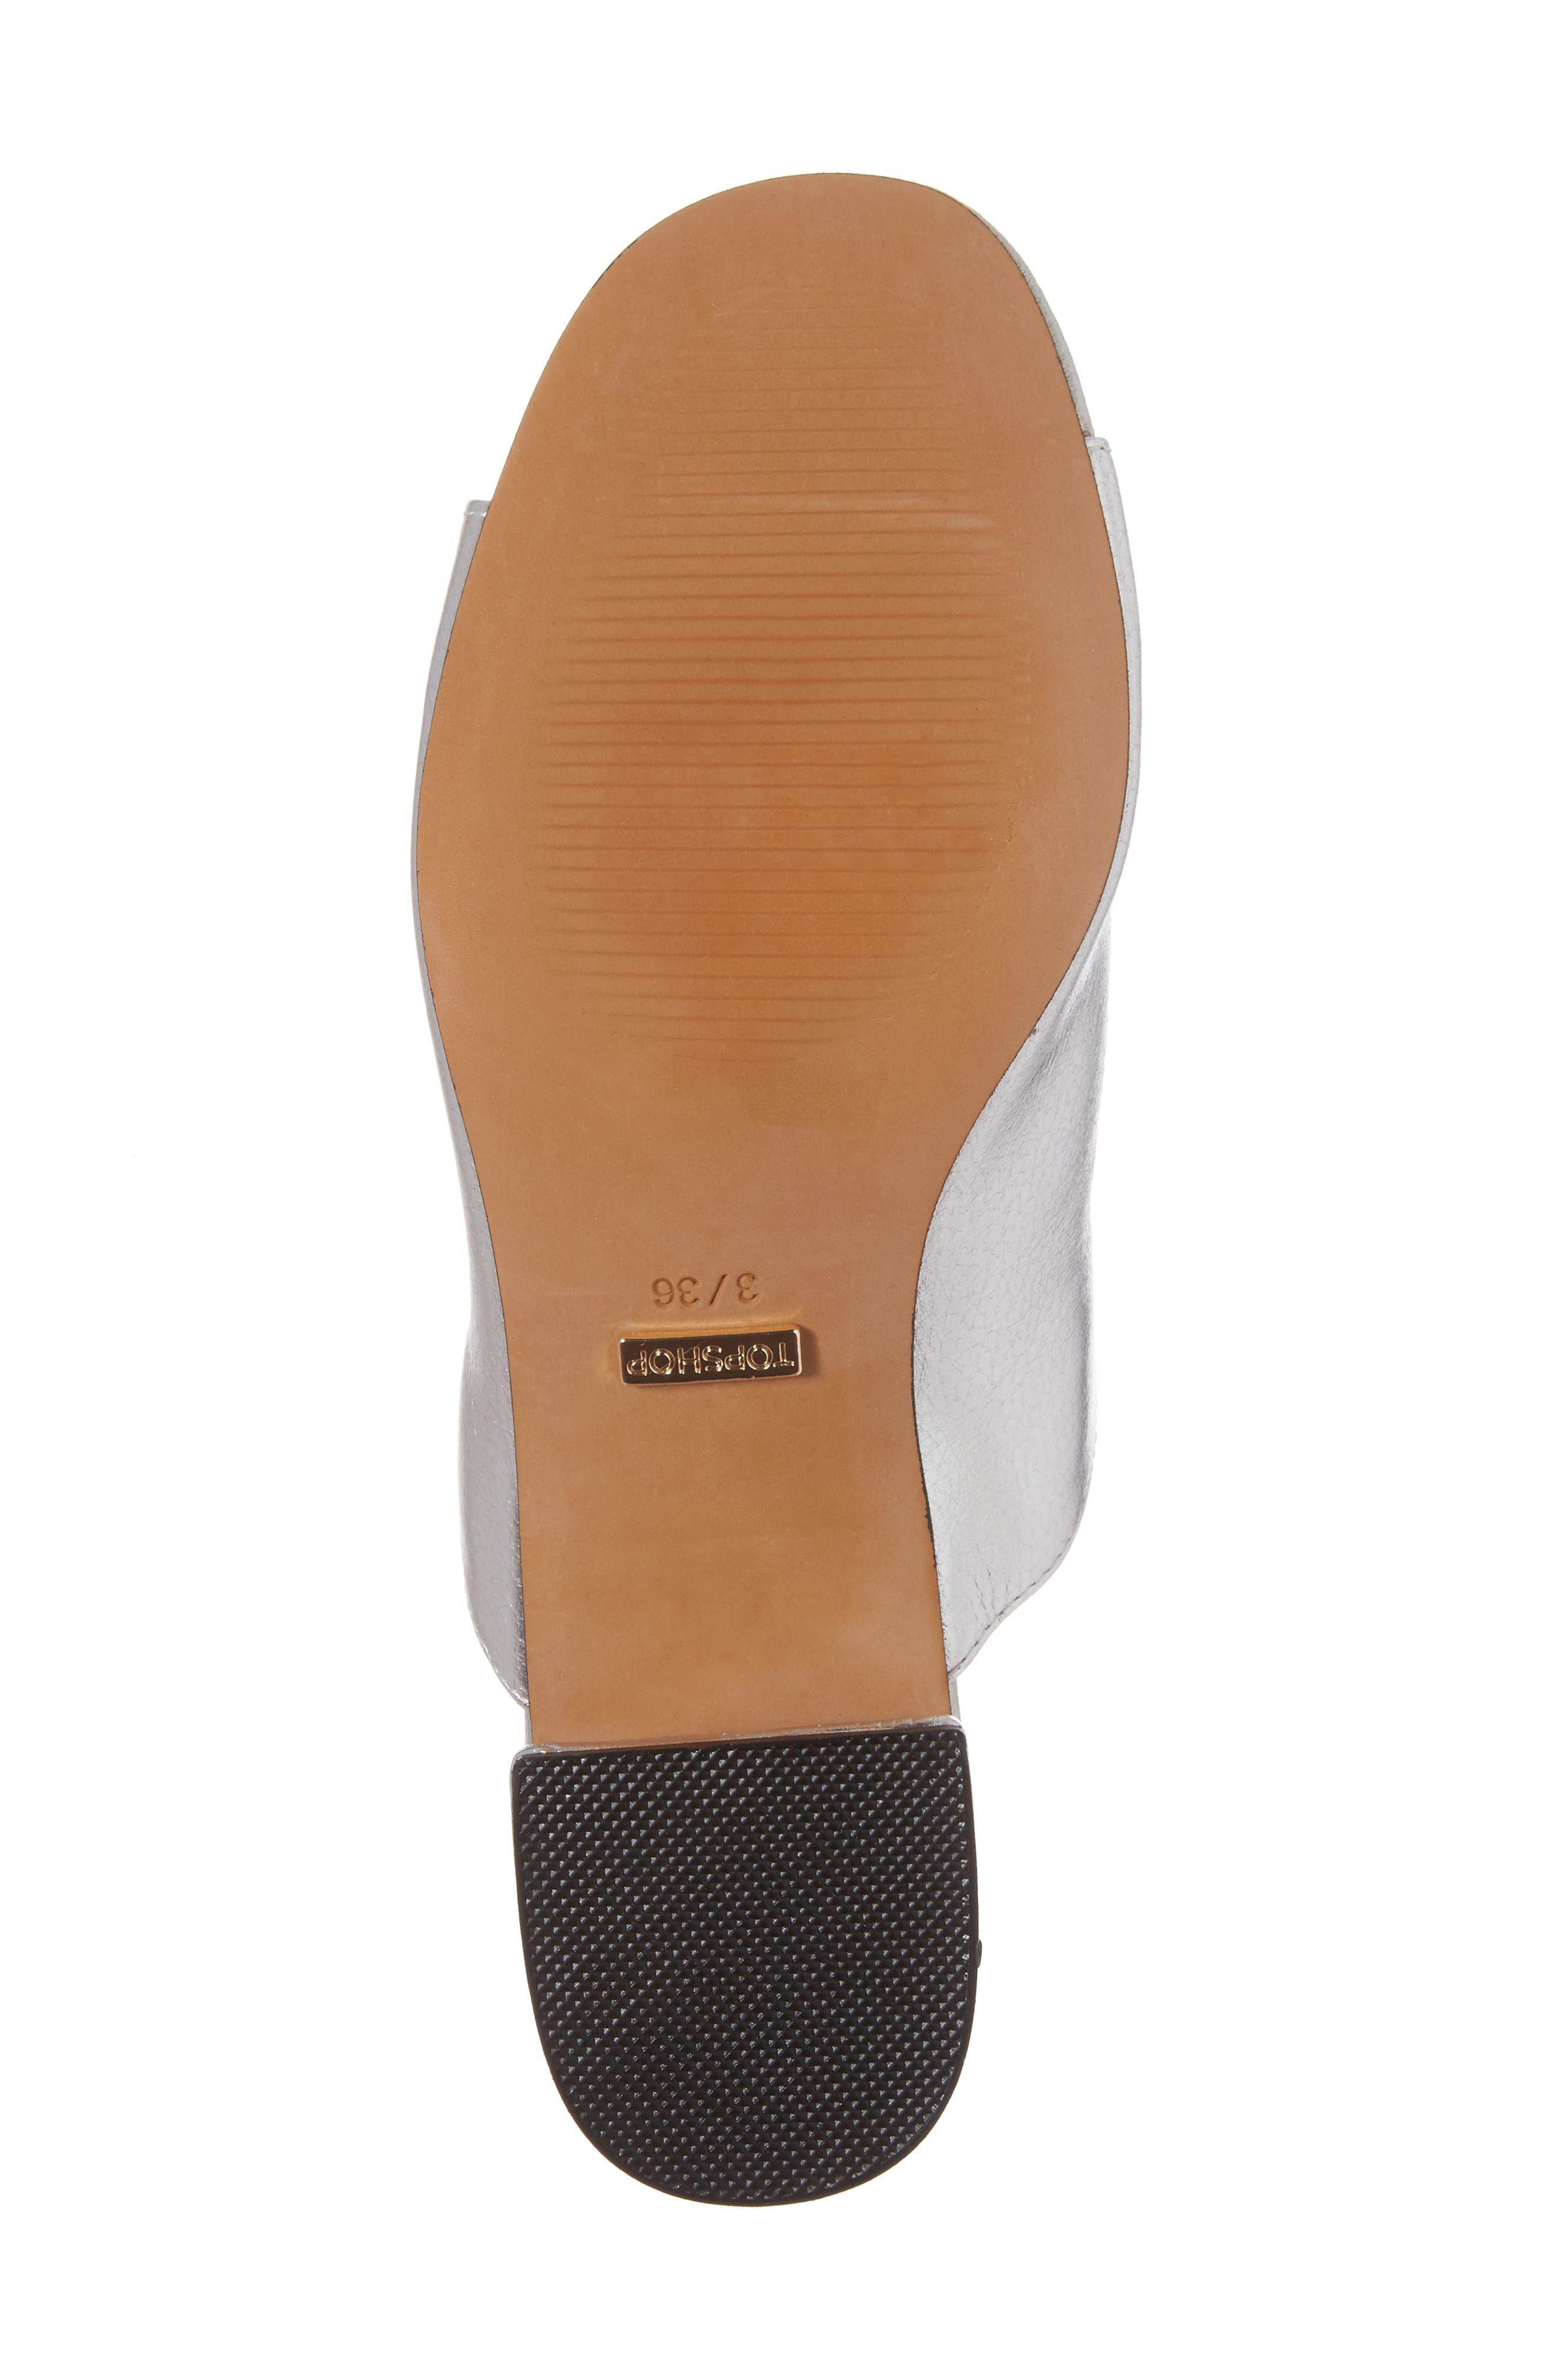 Notorious Metallic Slide Sandal,                             Alternate thumbnail 6, color,                             040